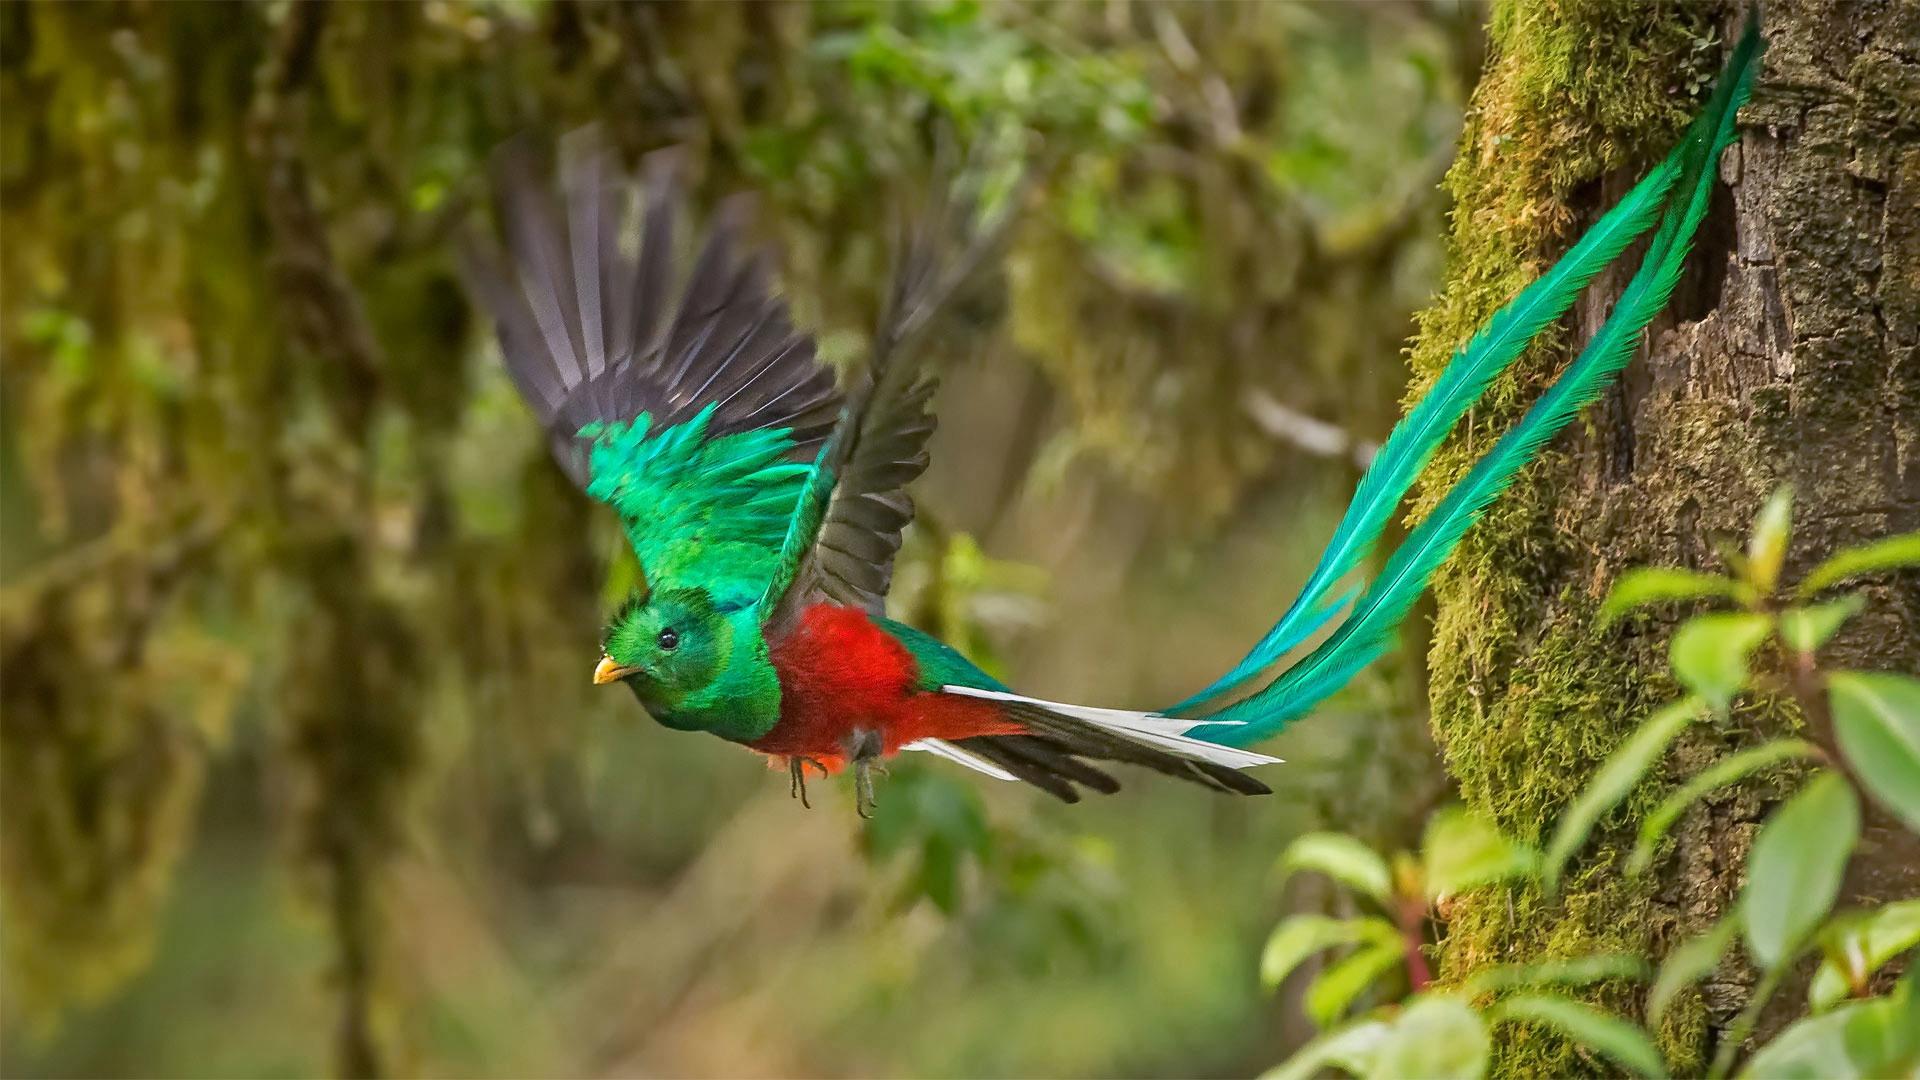 Quetzal HD Wallpaper Background Image 1920x1080 ID914923 1920x1080